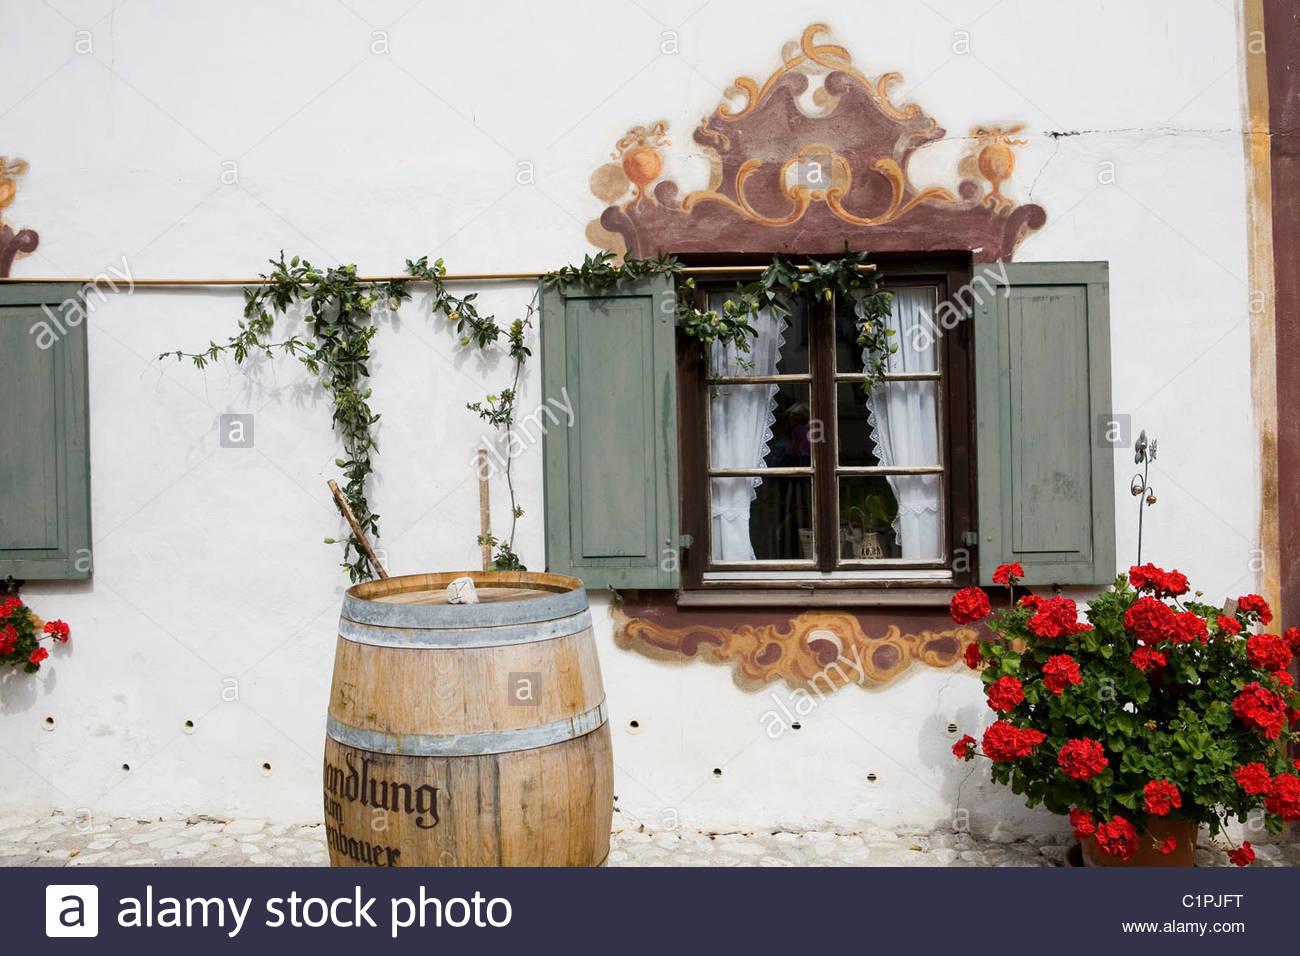 Germany, Bavaria, Oberammergau, facade - Stock Image